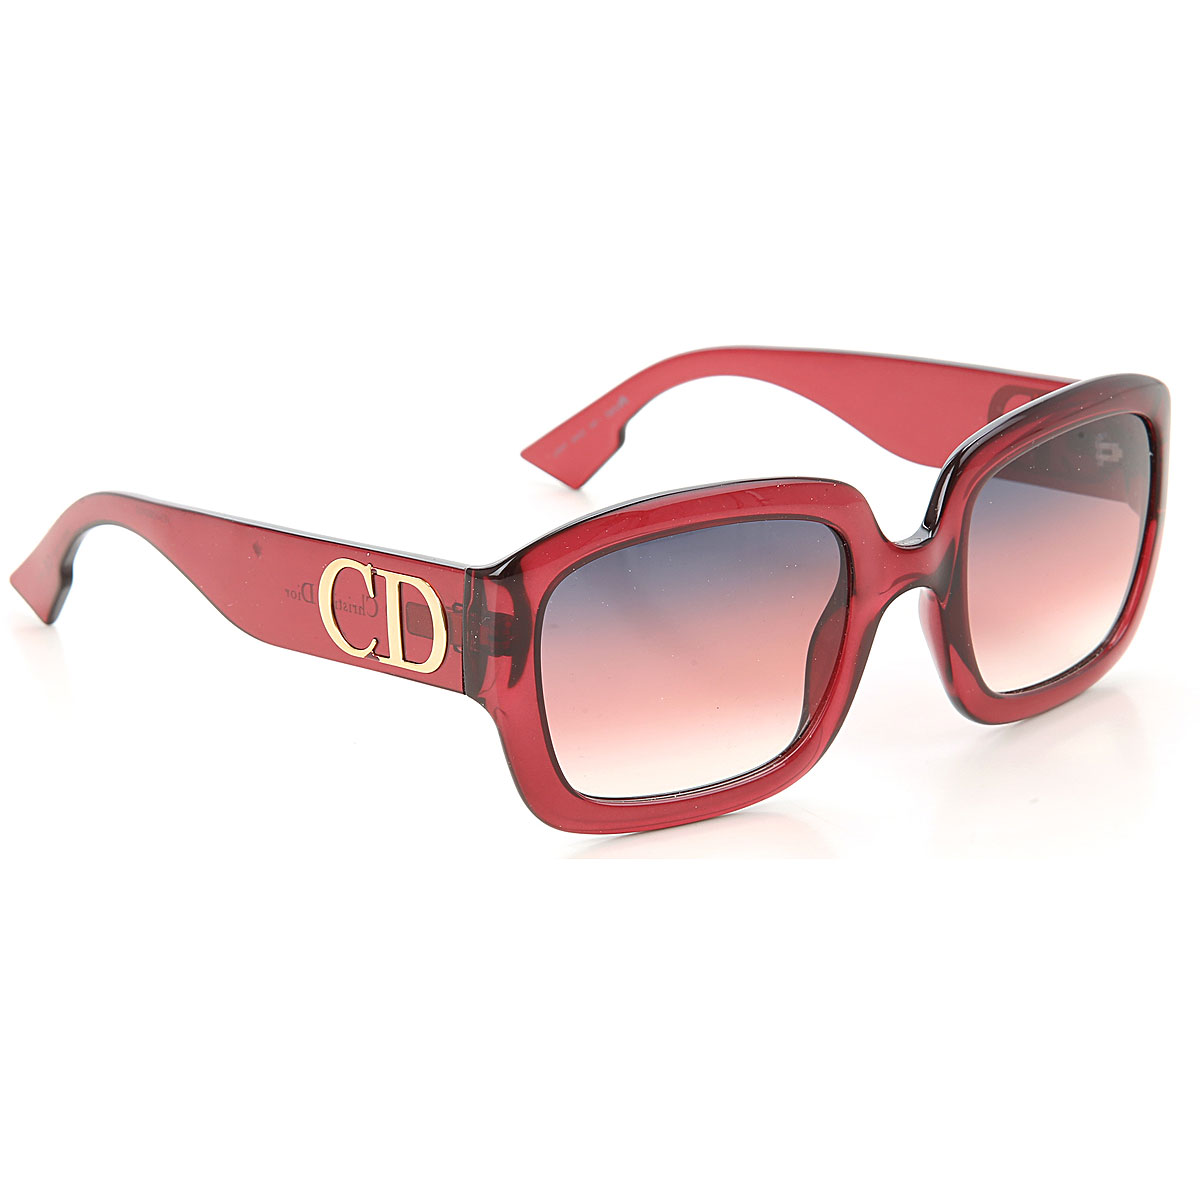 Christian Dior Sunglasses On Sale, Burgundy, 2019